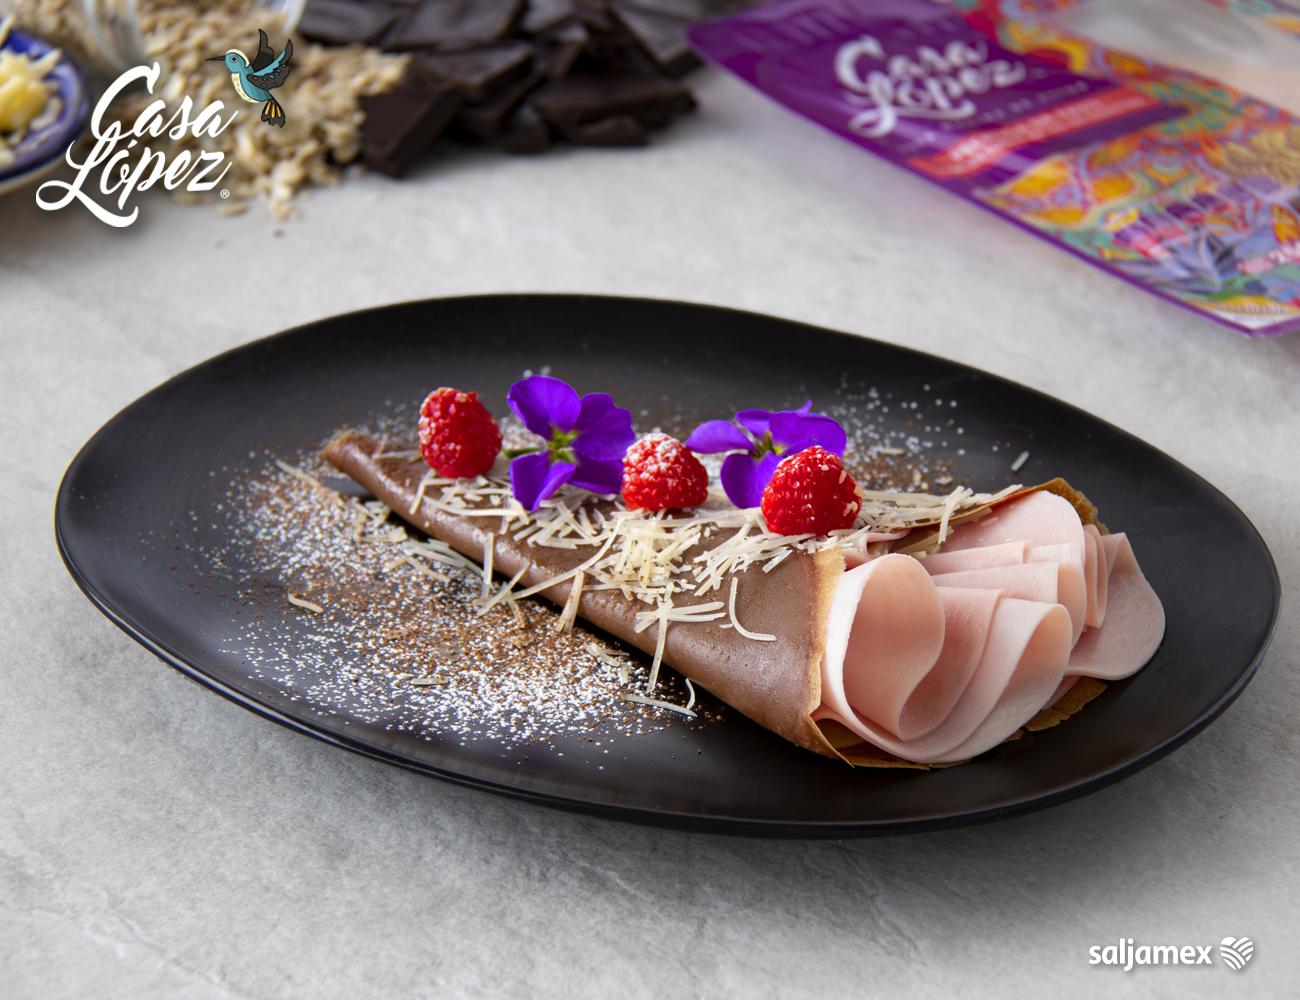 crepas de cacao con un toque de sal de celestun casa lopez